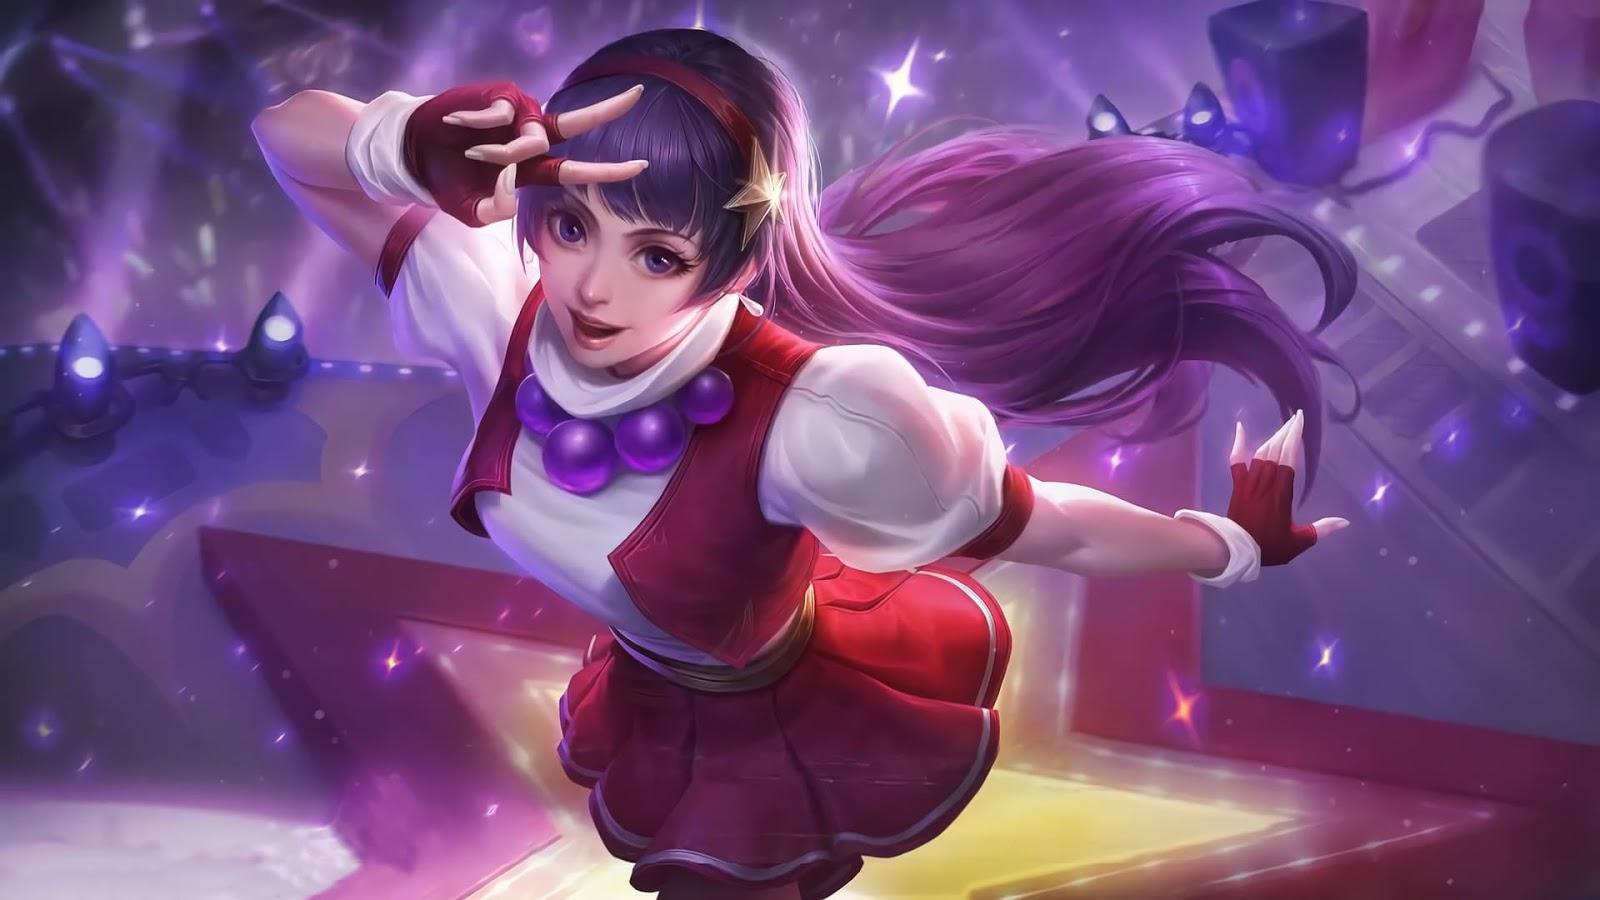 Wallpaper Guinevere Athena Asamiya KOF Skin Mobile Legends HD for PC